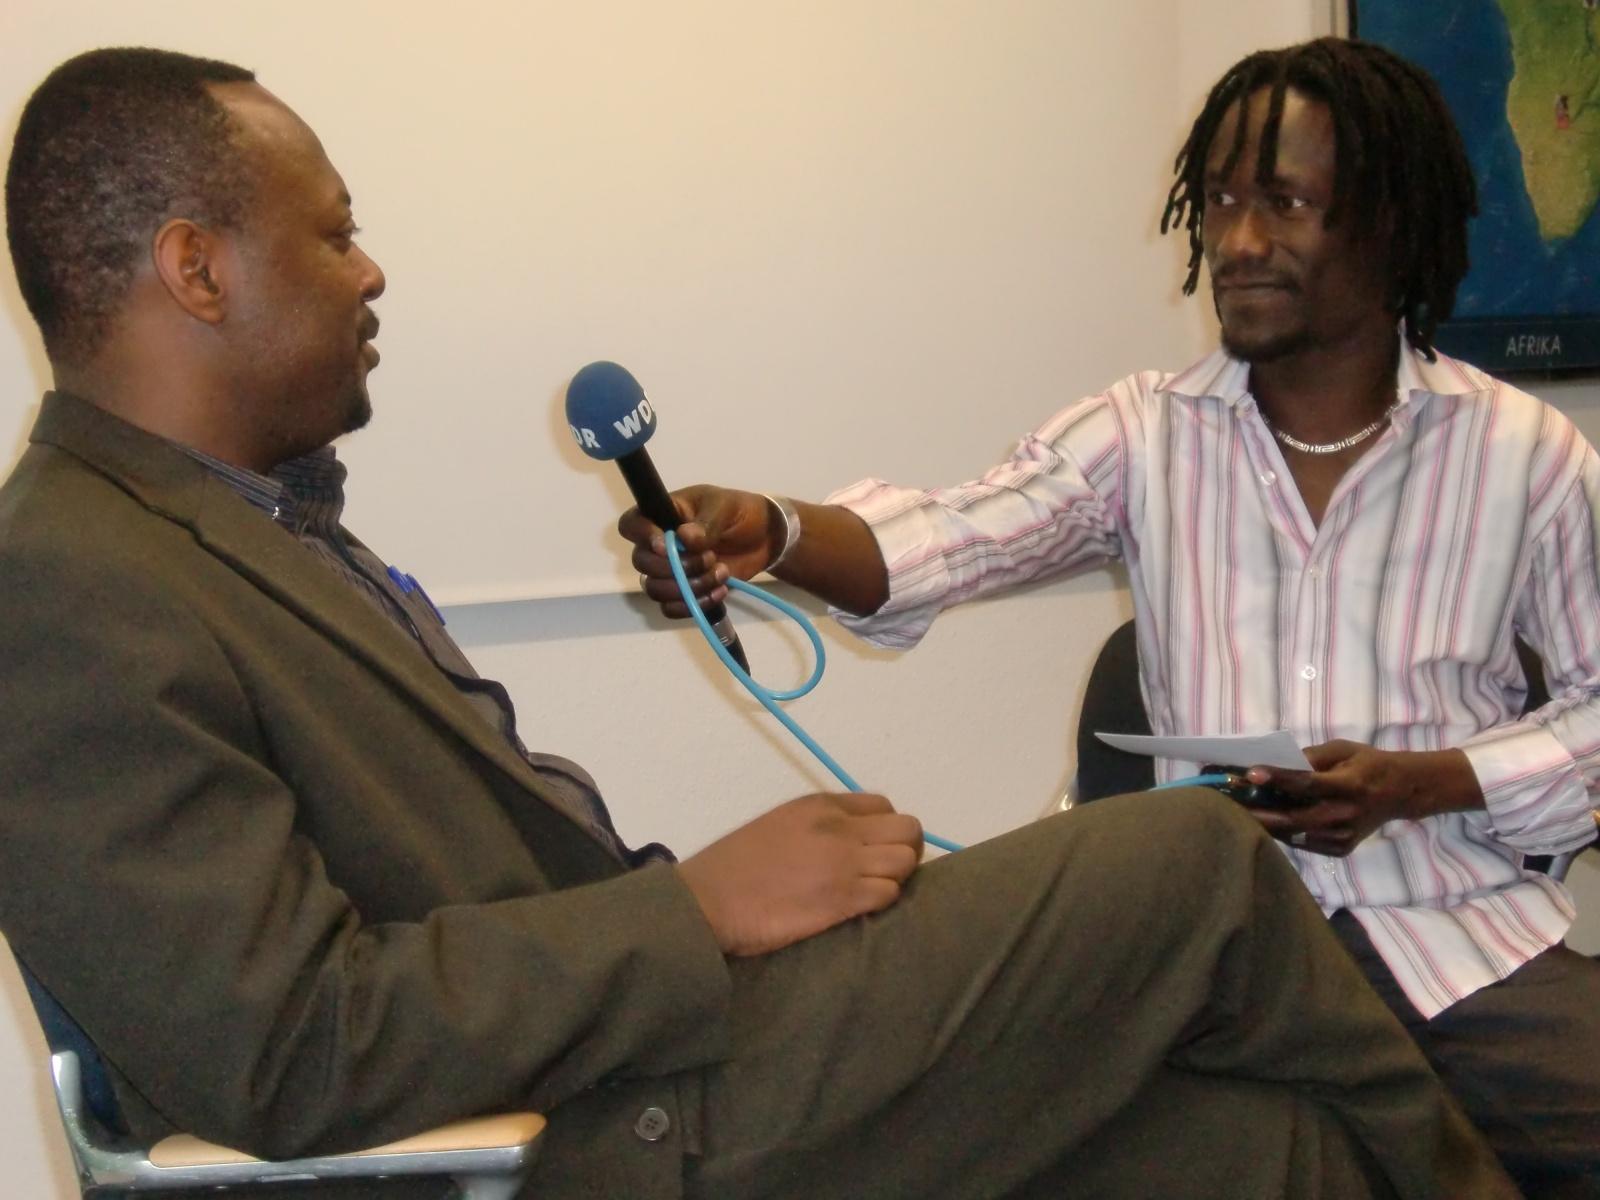 AGGN fellows at a media skills training